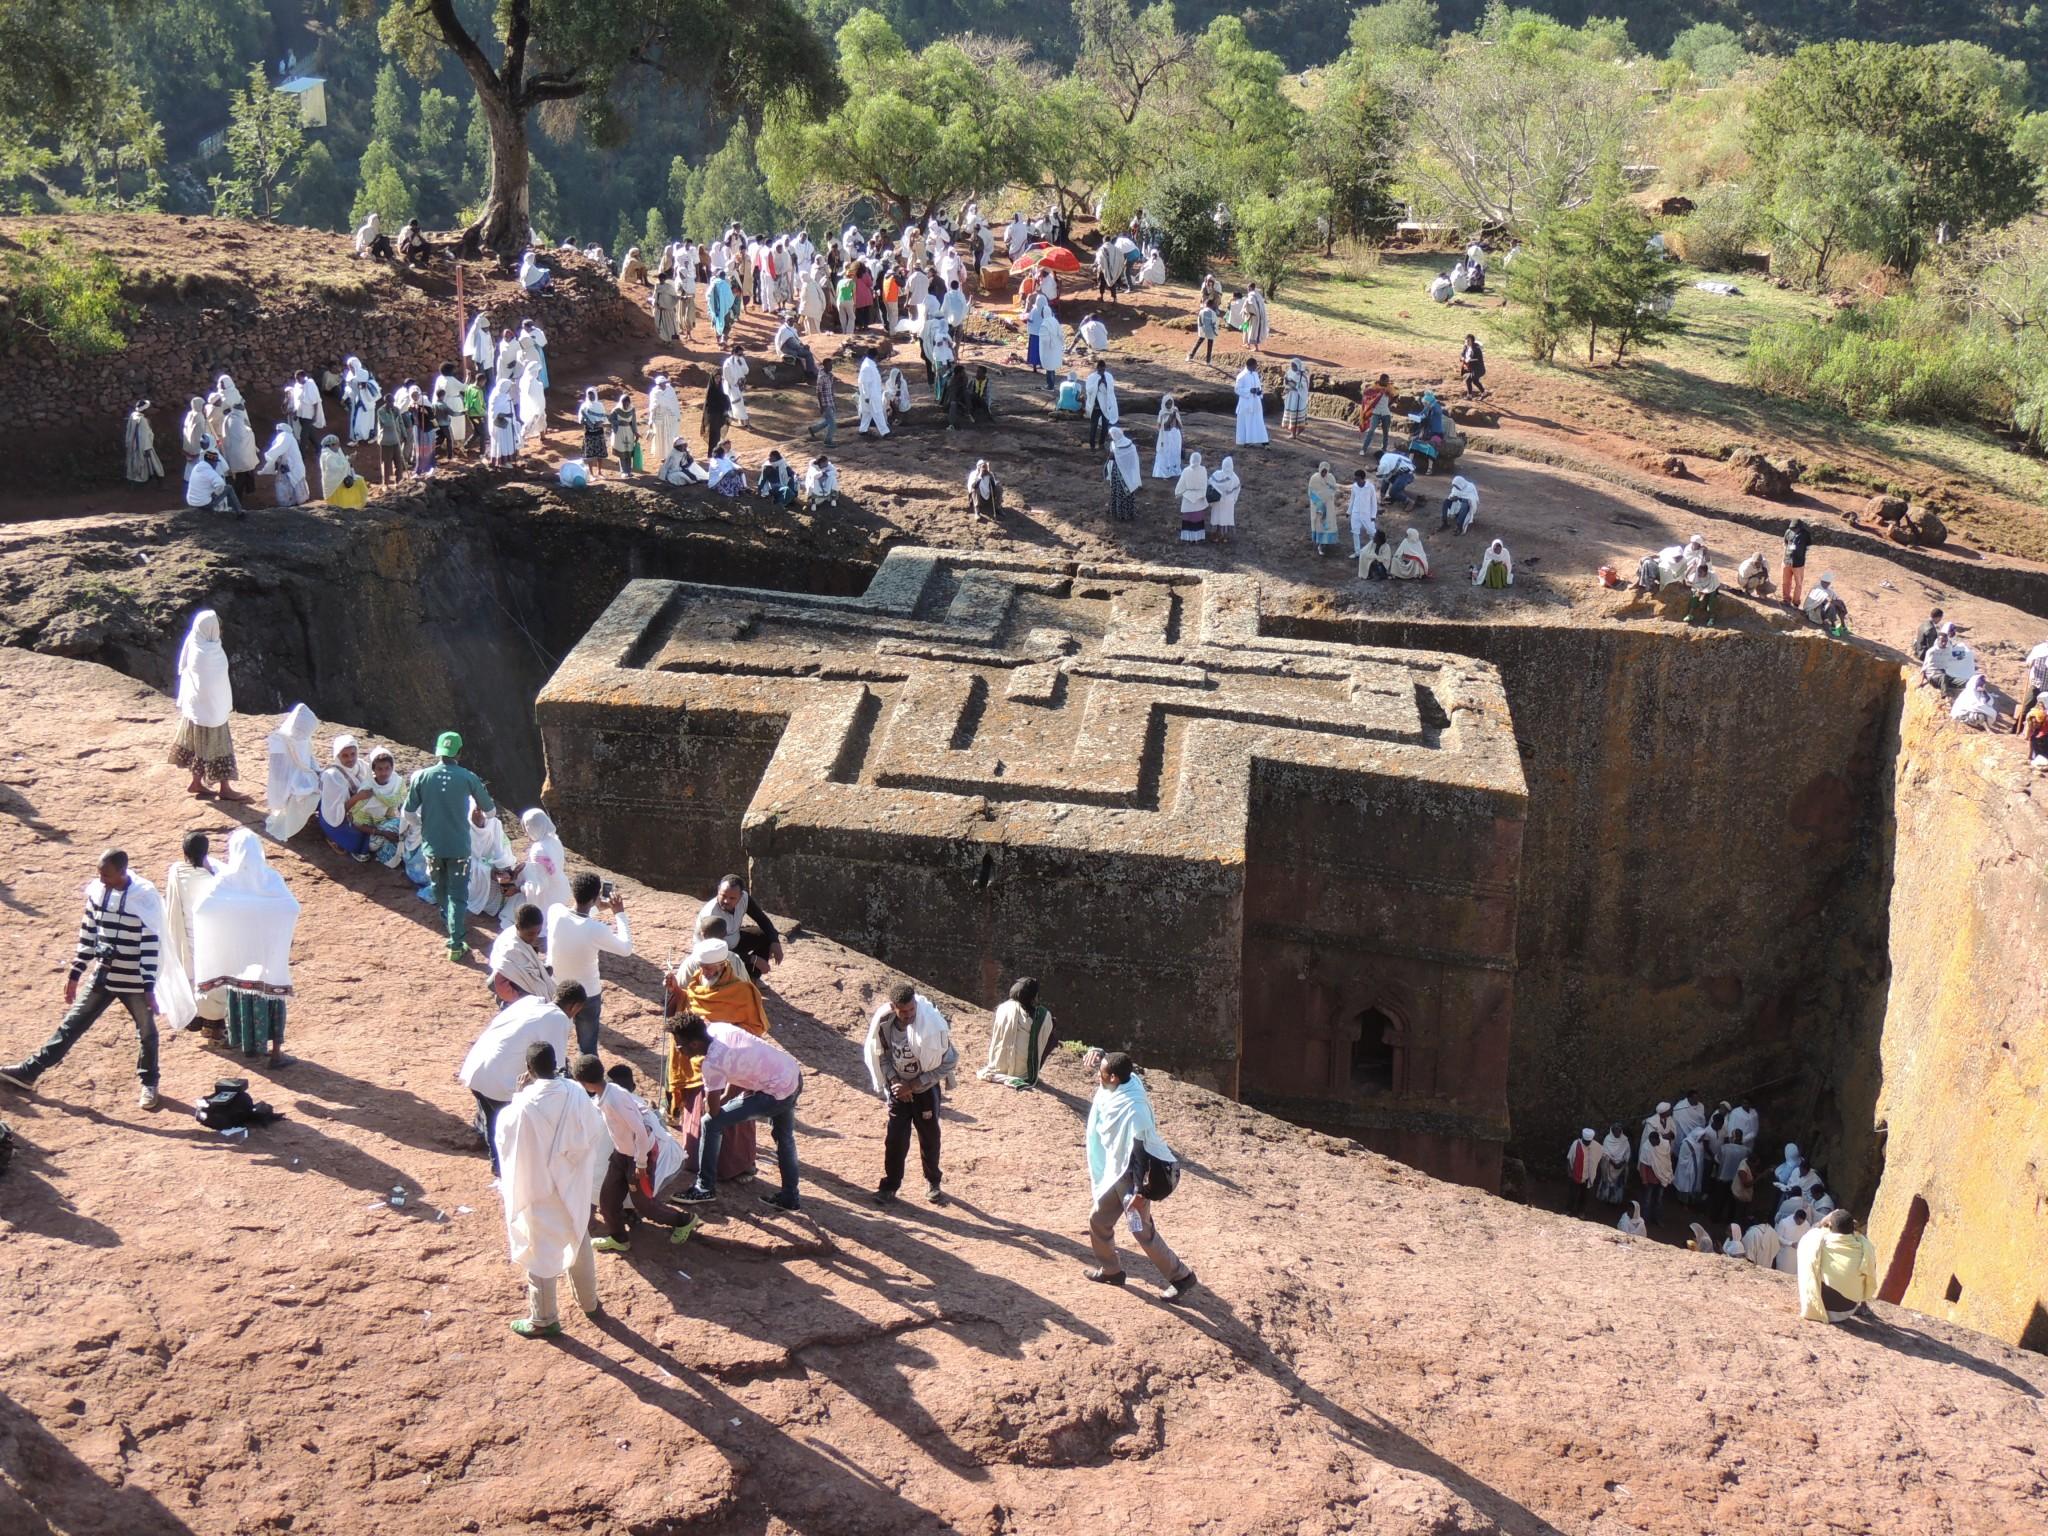 Ethiopie, Sint-Joriskerk in Lalibela